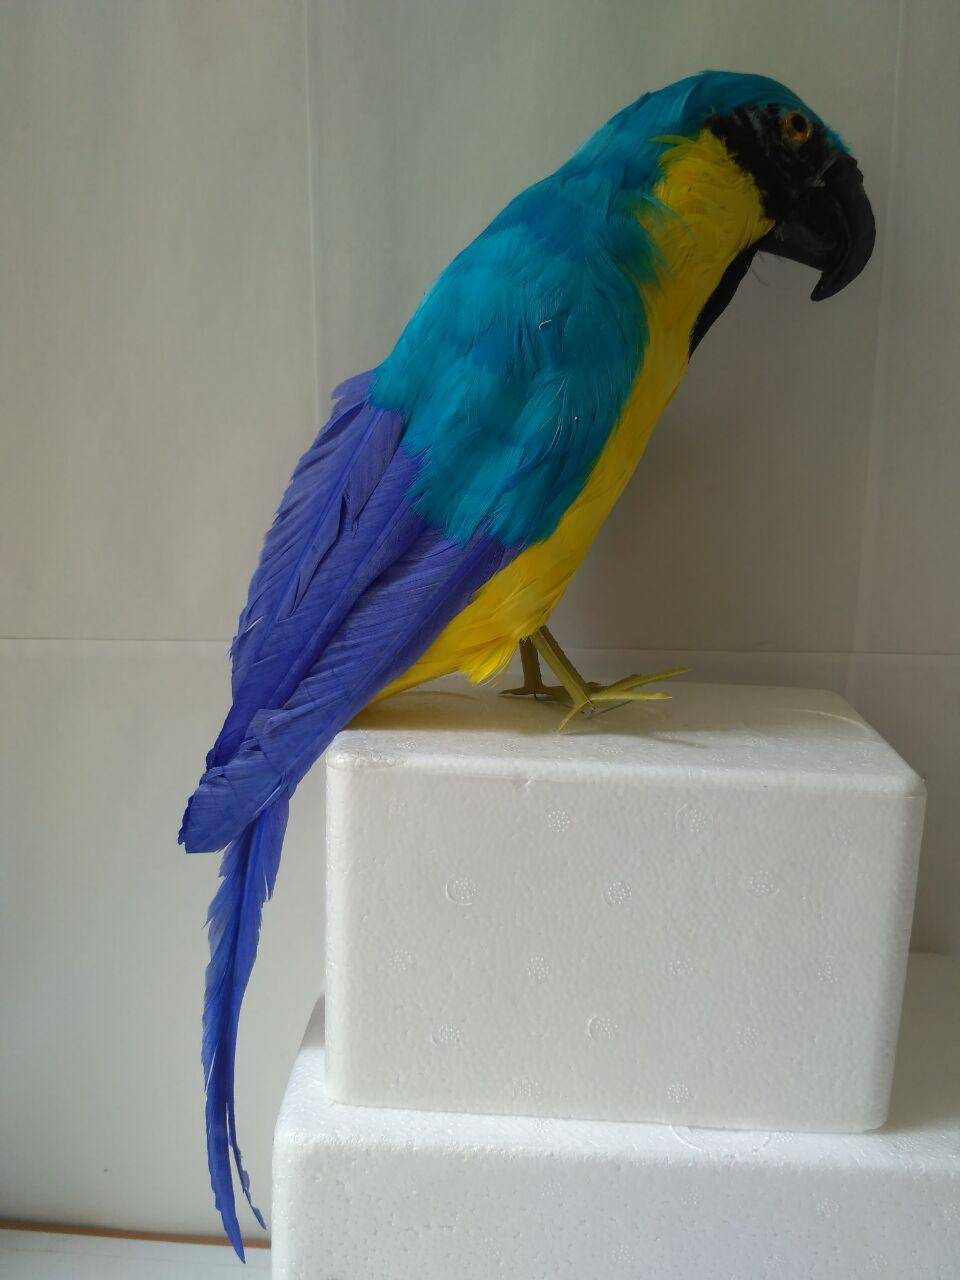 new simulation blue parrot model foam&feathers parrot bird about 40cm